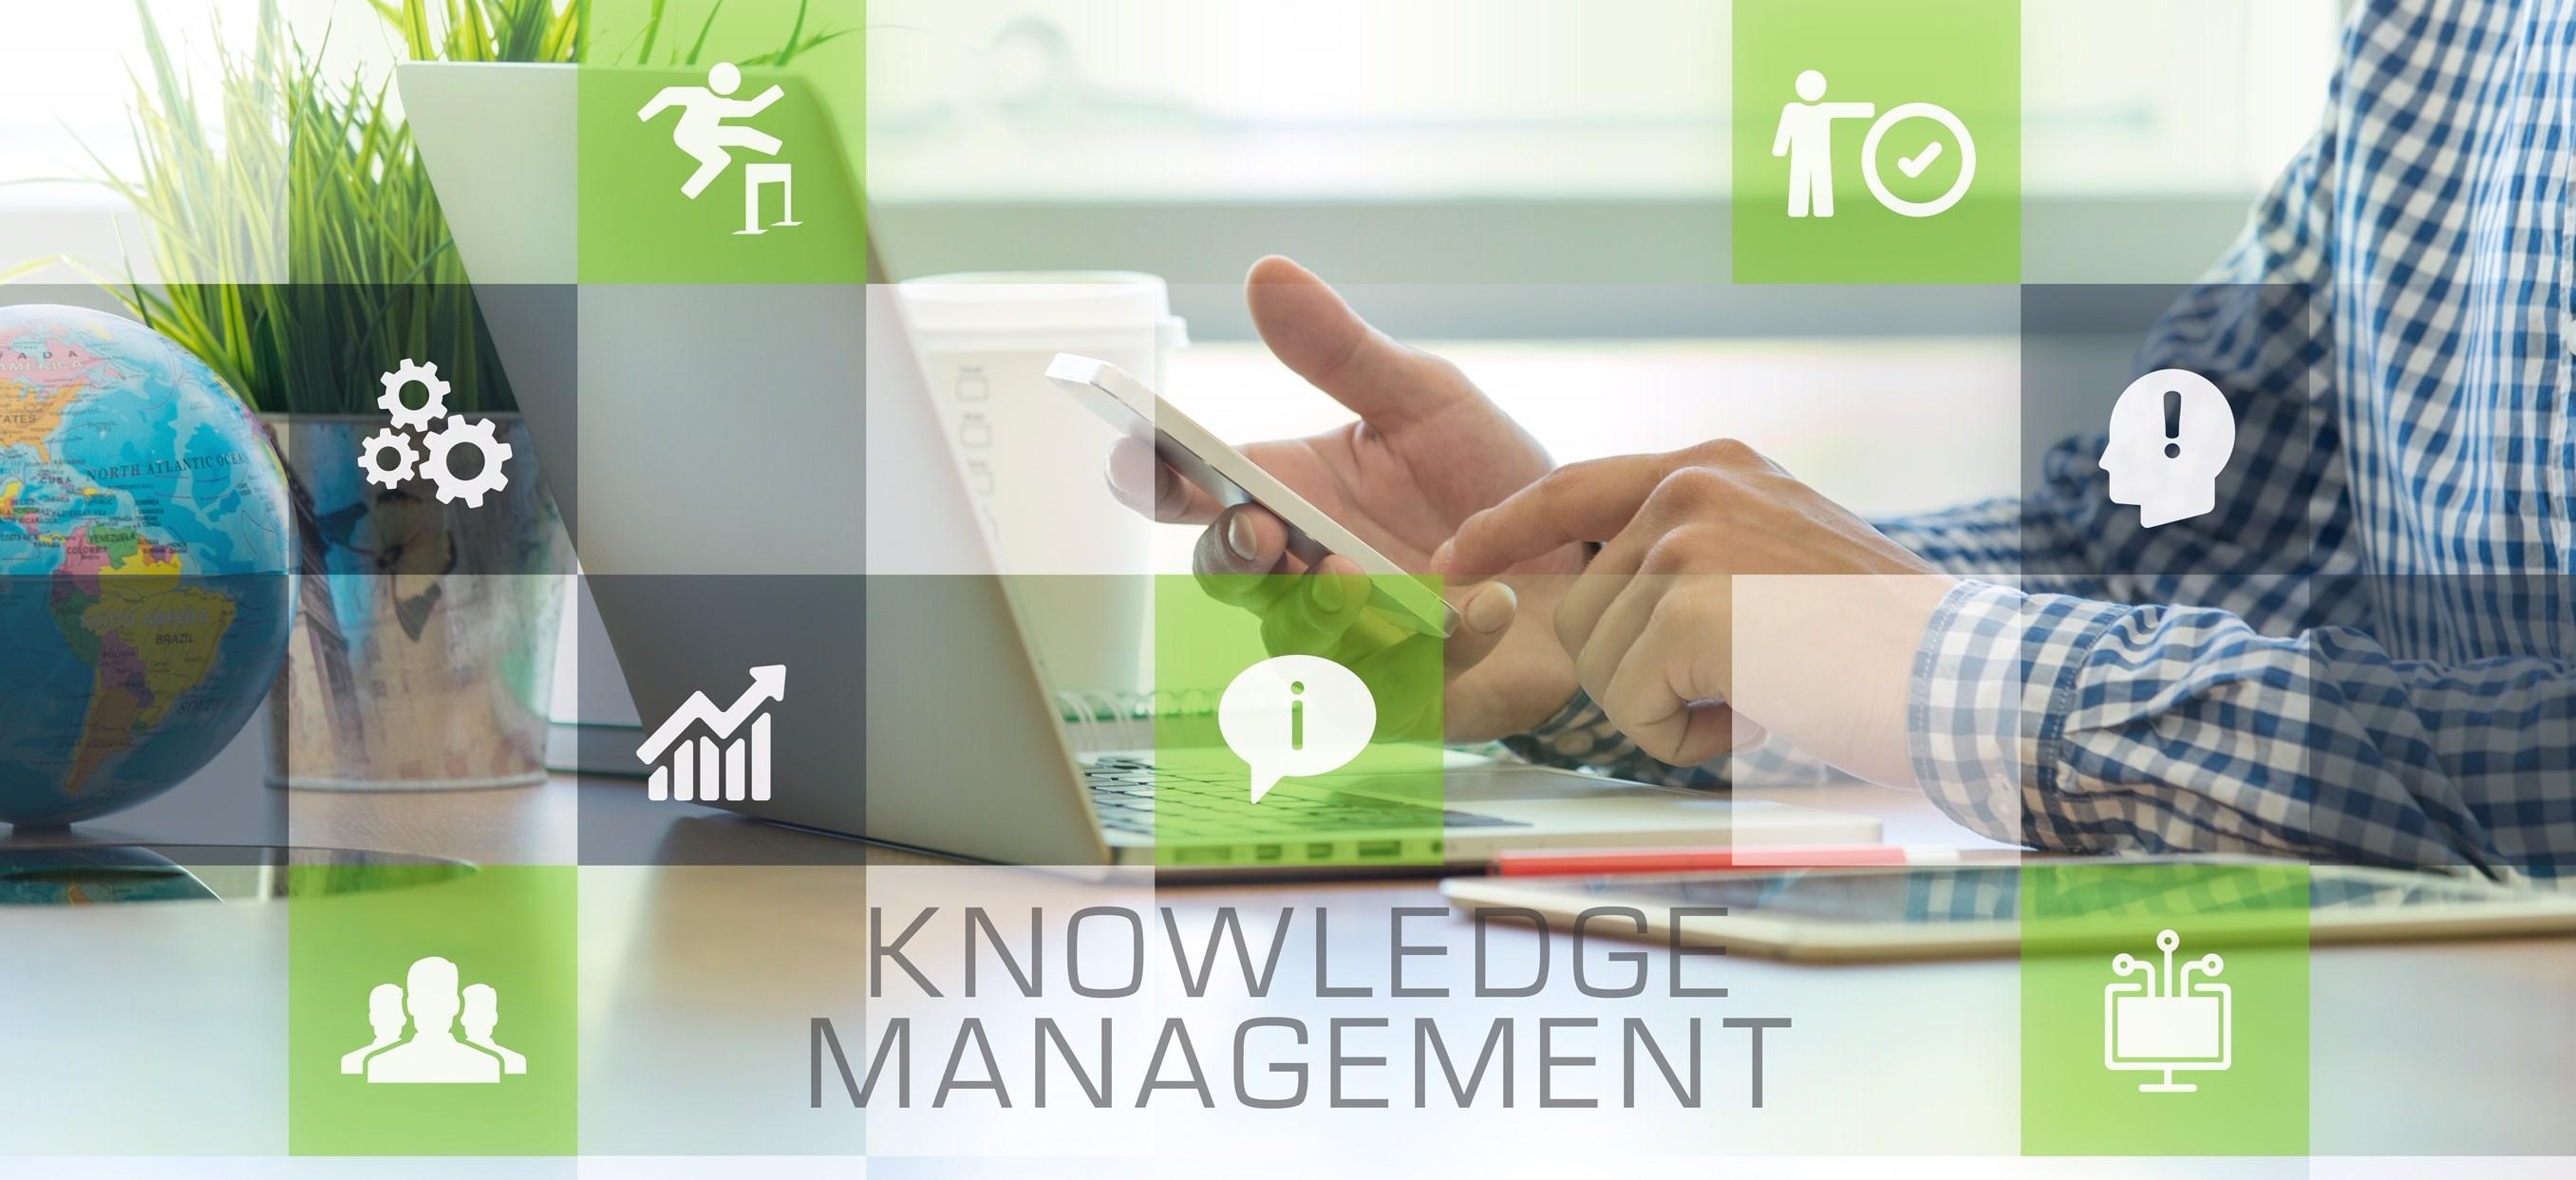 Knowledge_Management_resize